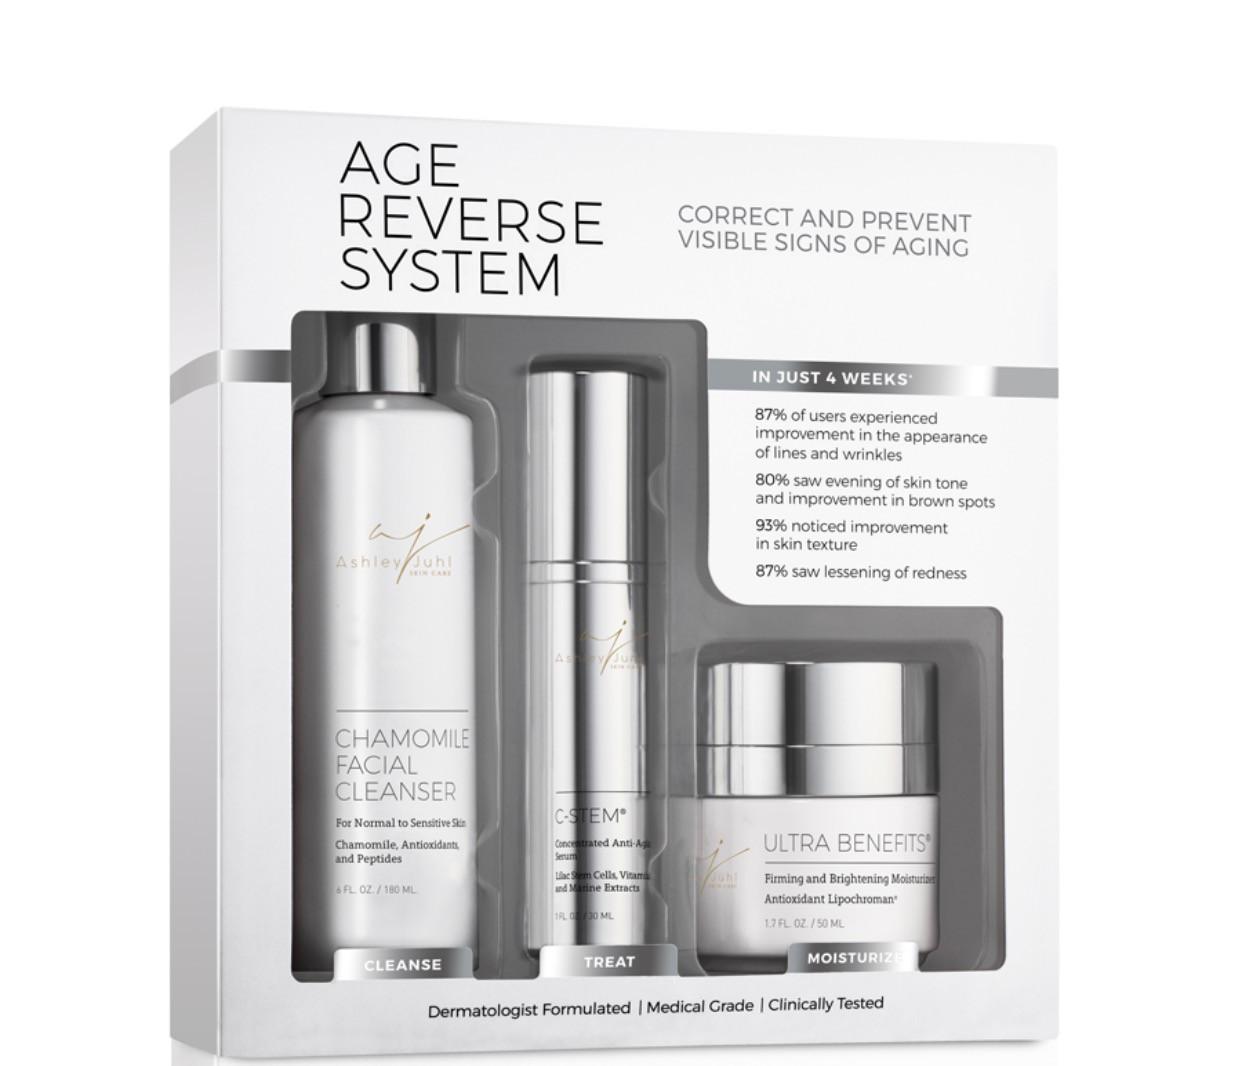 Age Reverse System AJ.jpg